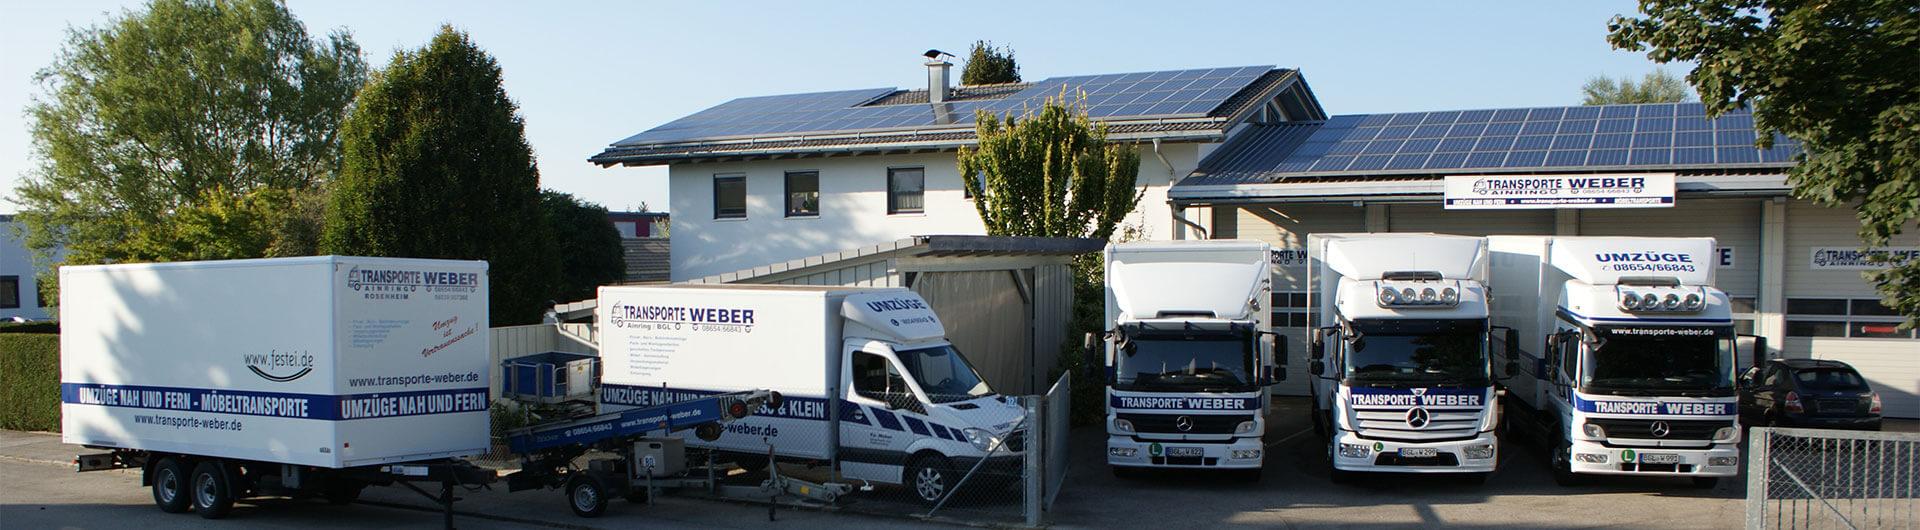 Transporte Weber